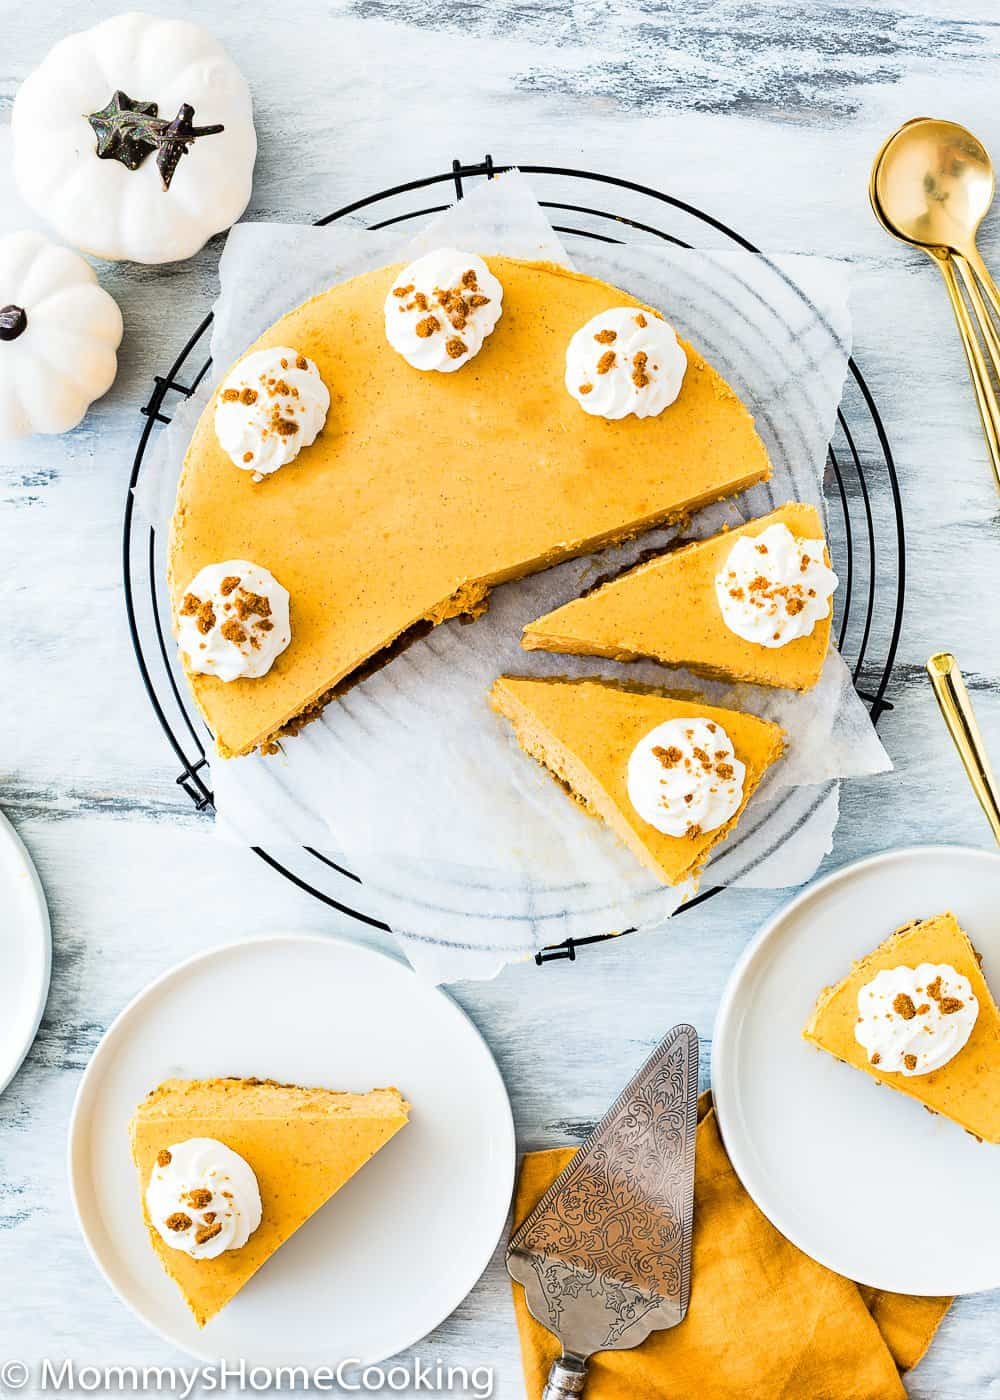 Eggless Pumpkin Cheesecake with whipped cream